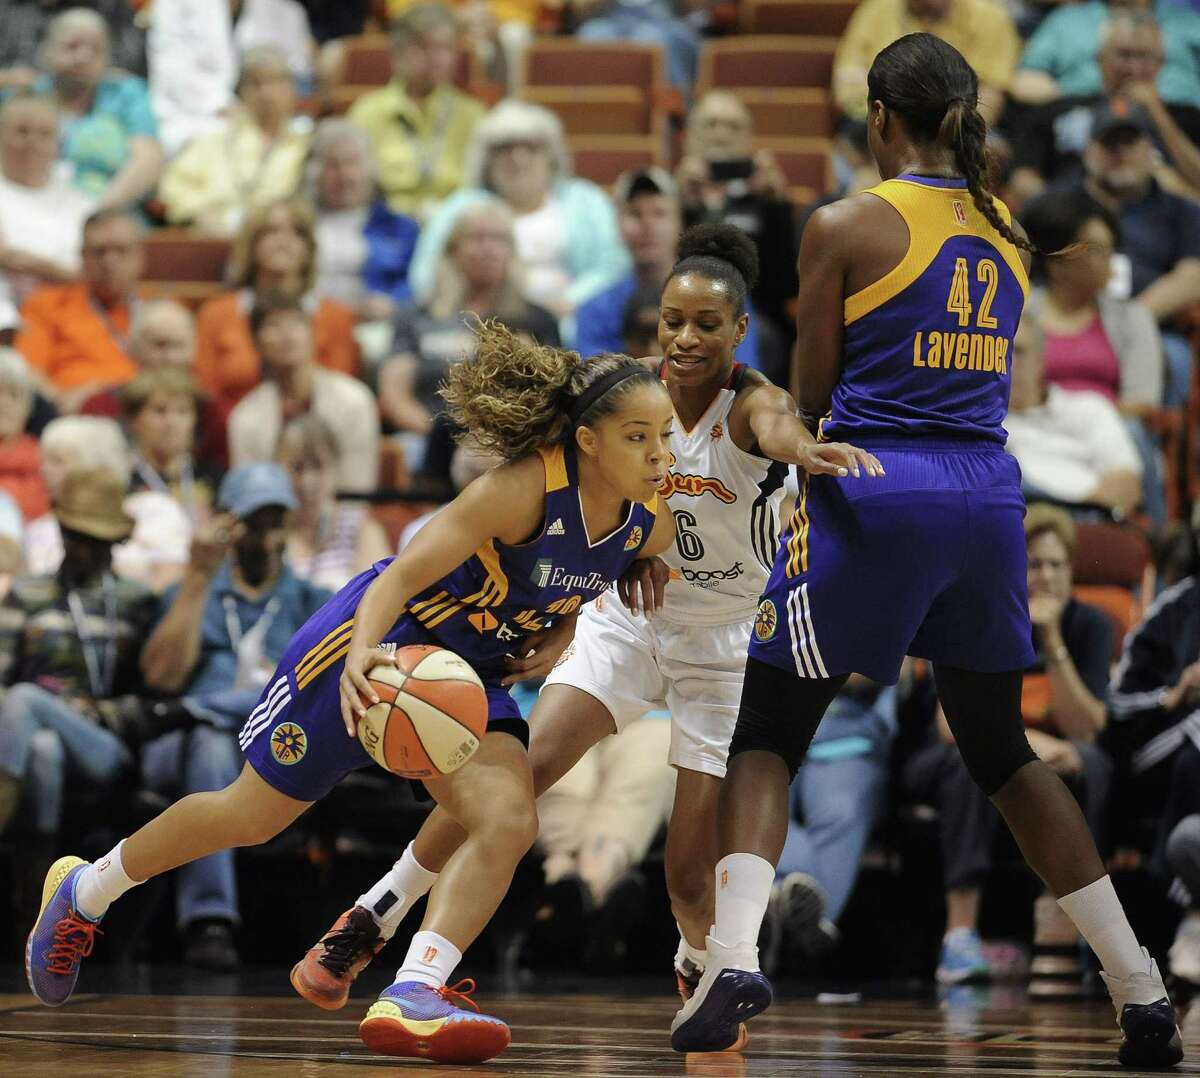 Los Angeles Sparksí Jasmine Lister, left, dribbles around Connecticut Sunís Jasmine Thomas, center, as Sparksí Jantel Lavender sets a pick during the first half of a WNBA basketball game, Friday, June 26, 2015, in Uncasville, Conn. (AP Photo/Jessica Hill)